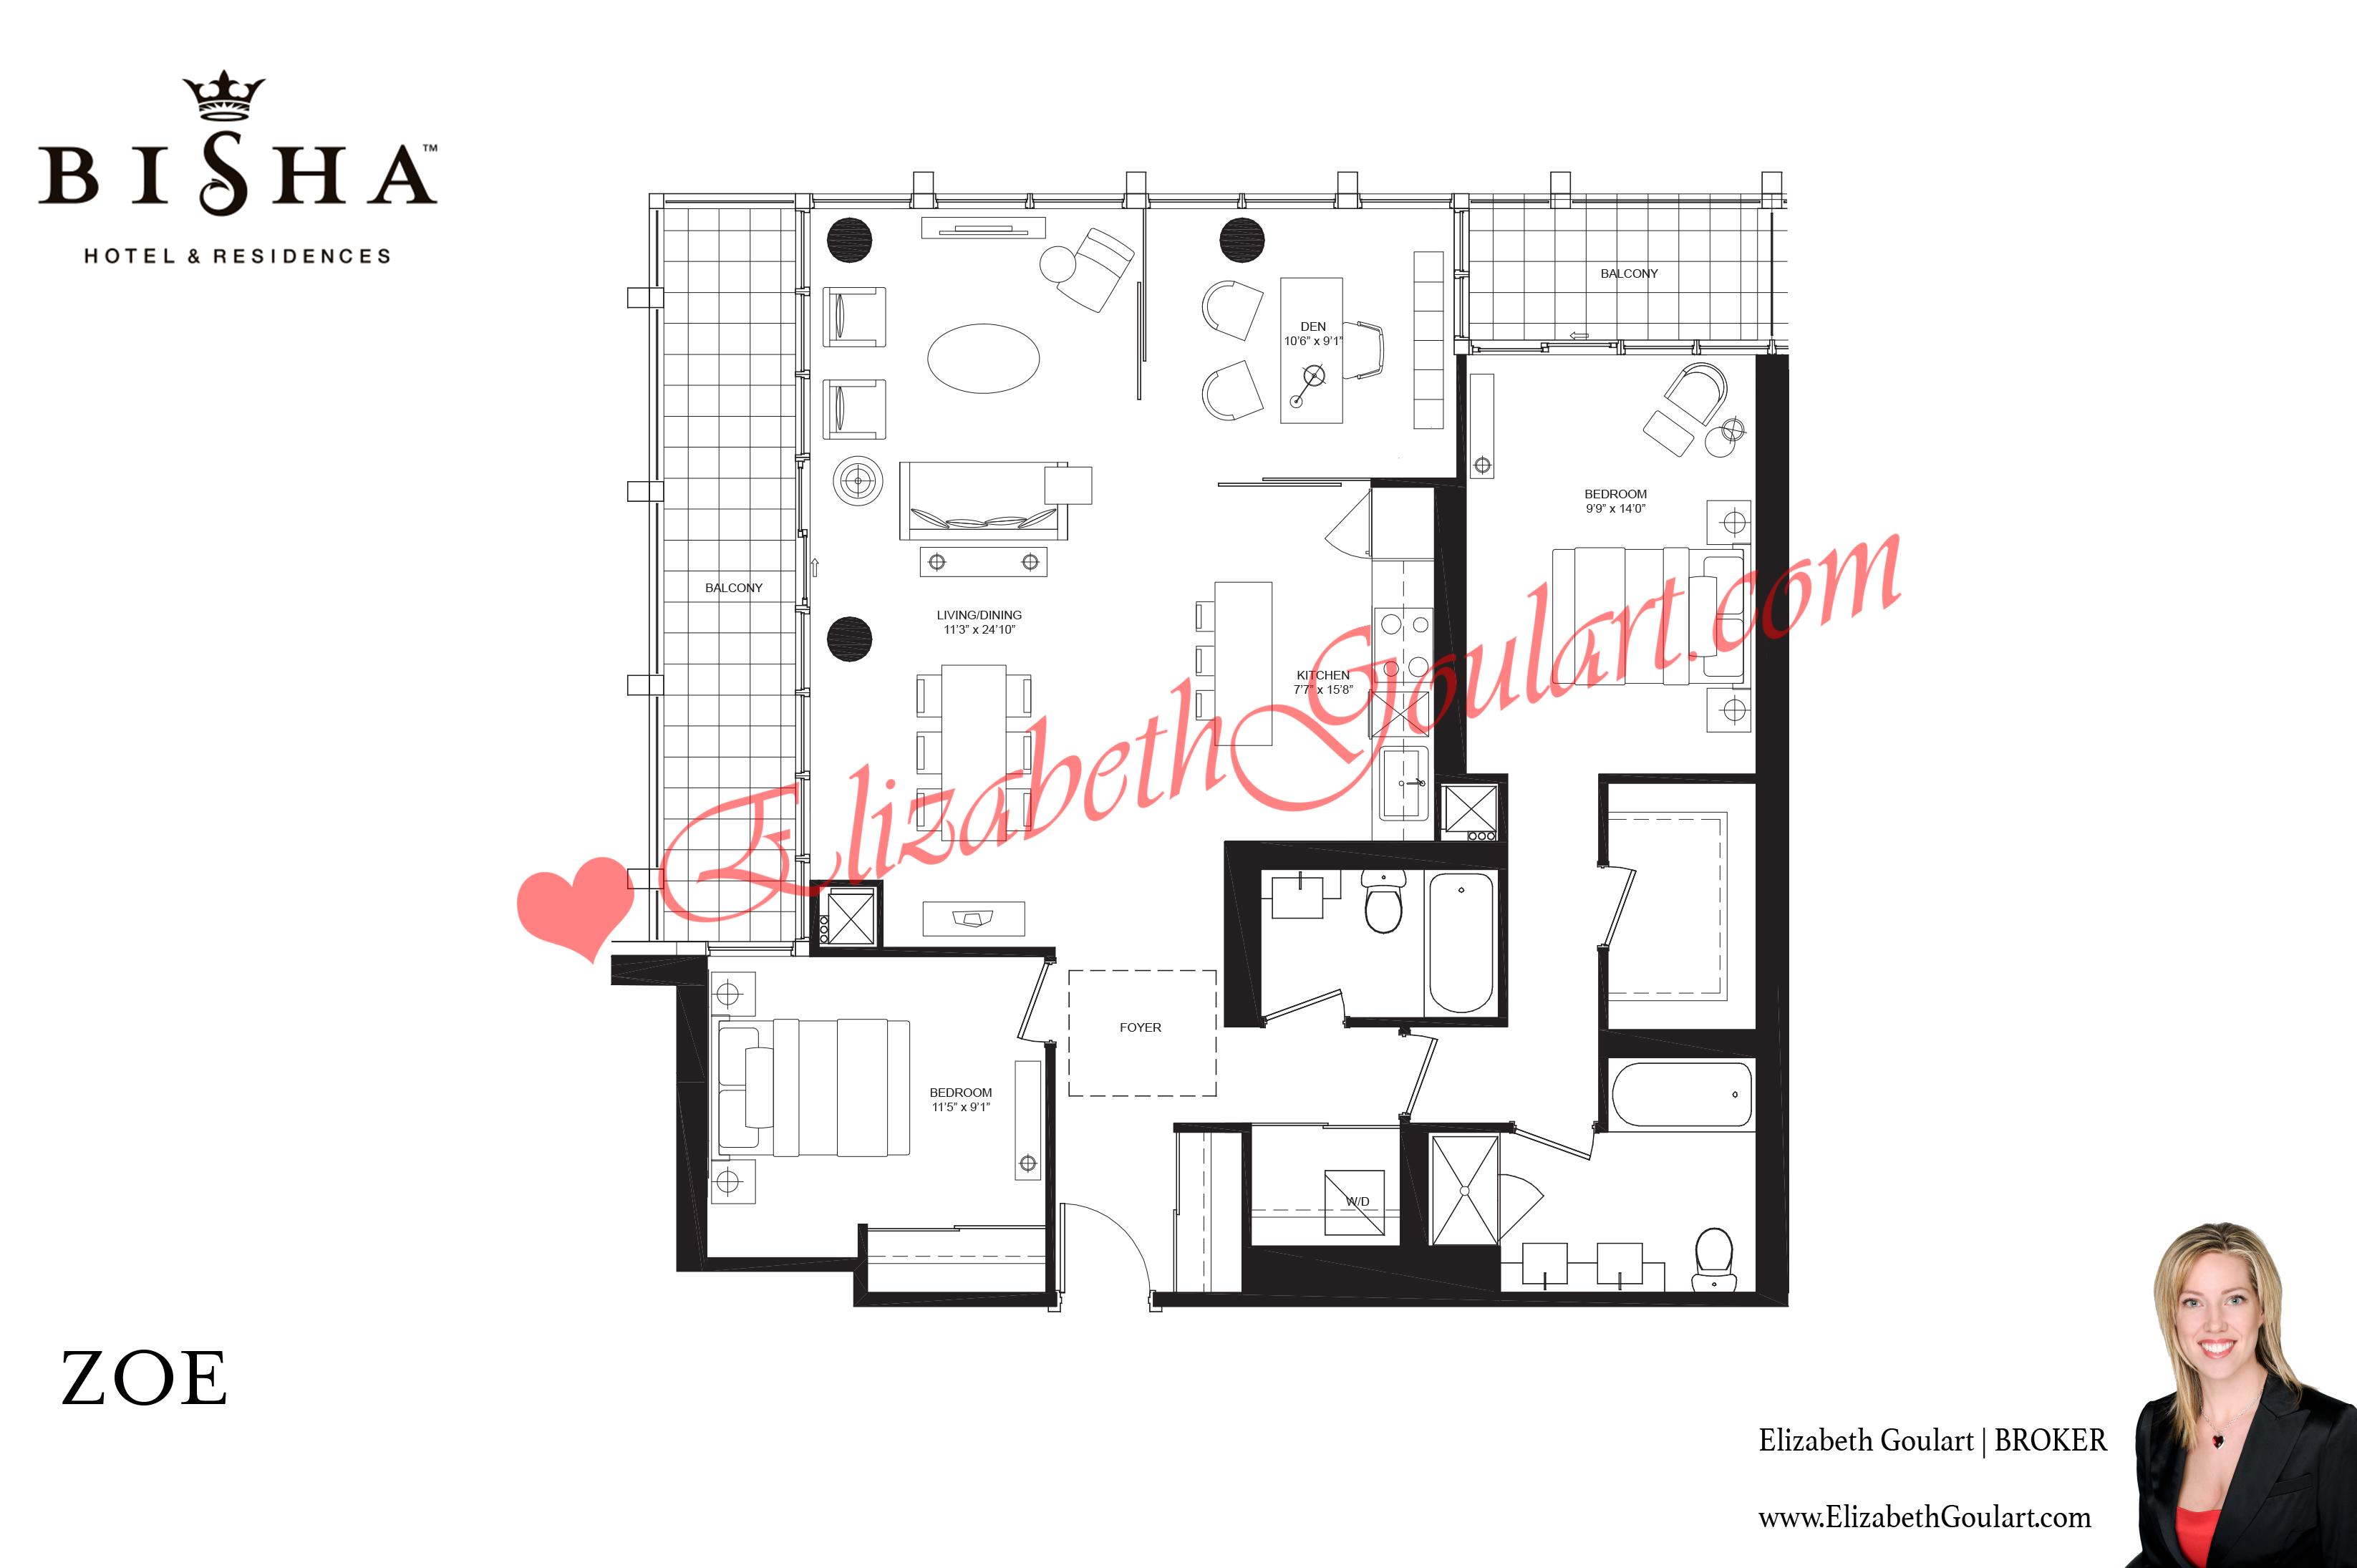 88 Blue Jays Way Bisha Condominiums For Sale Rent Elizabeth Goulart Broker